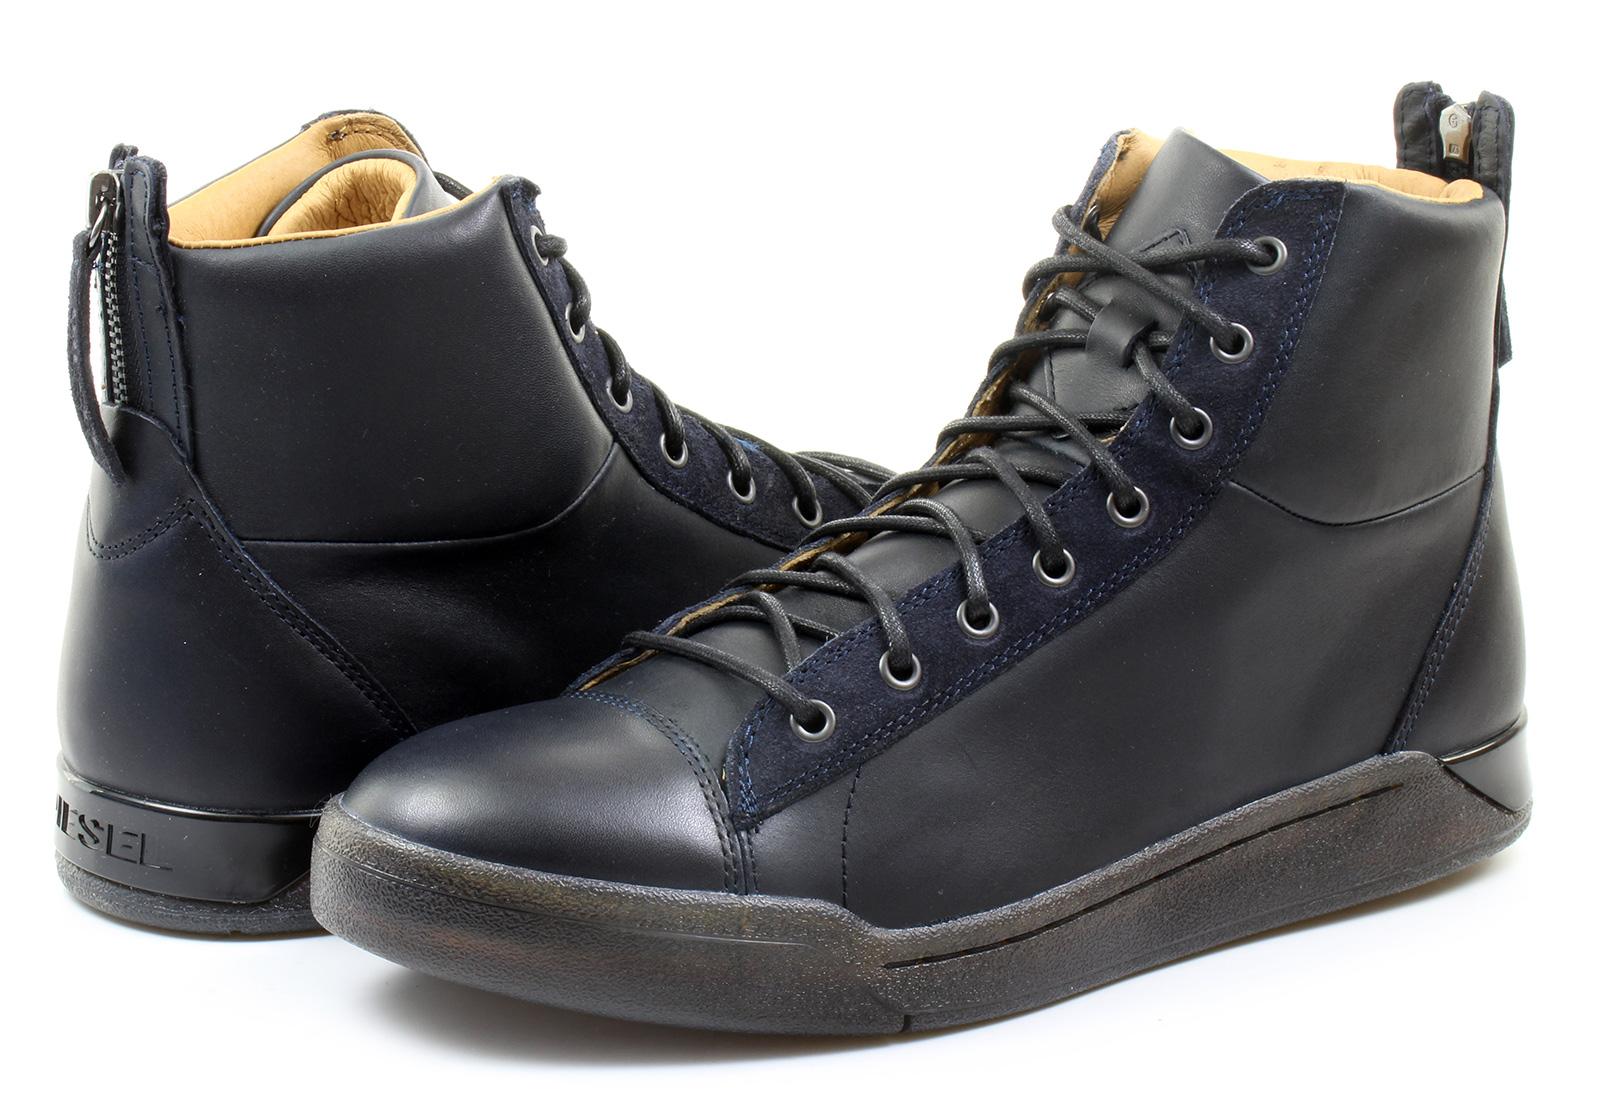 Diesel Shoes - Diamond - 791-131-6059 - Online shop for ...